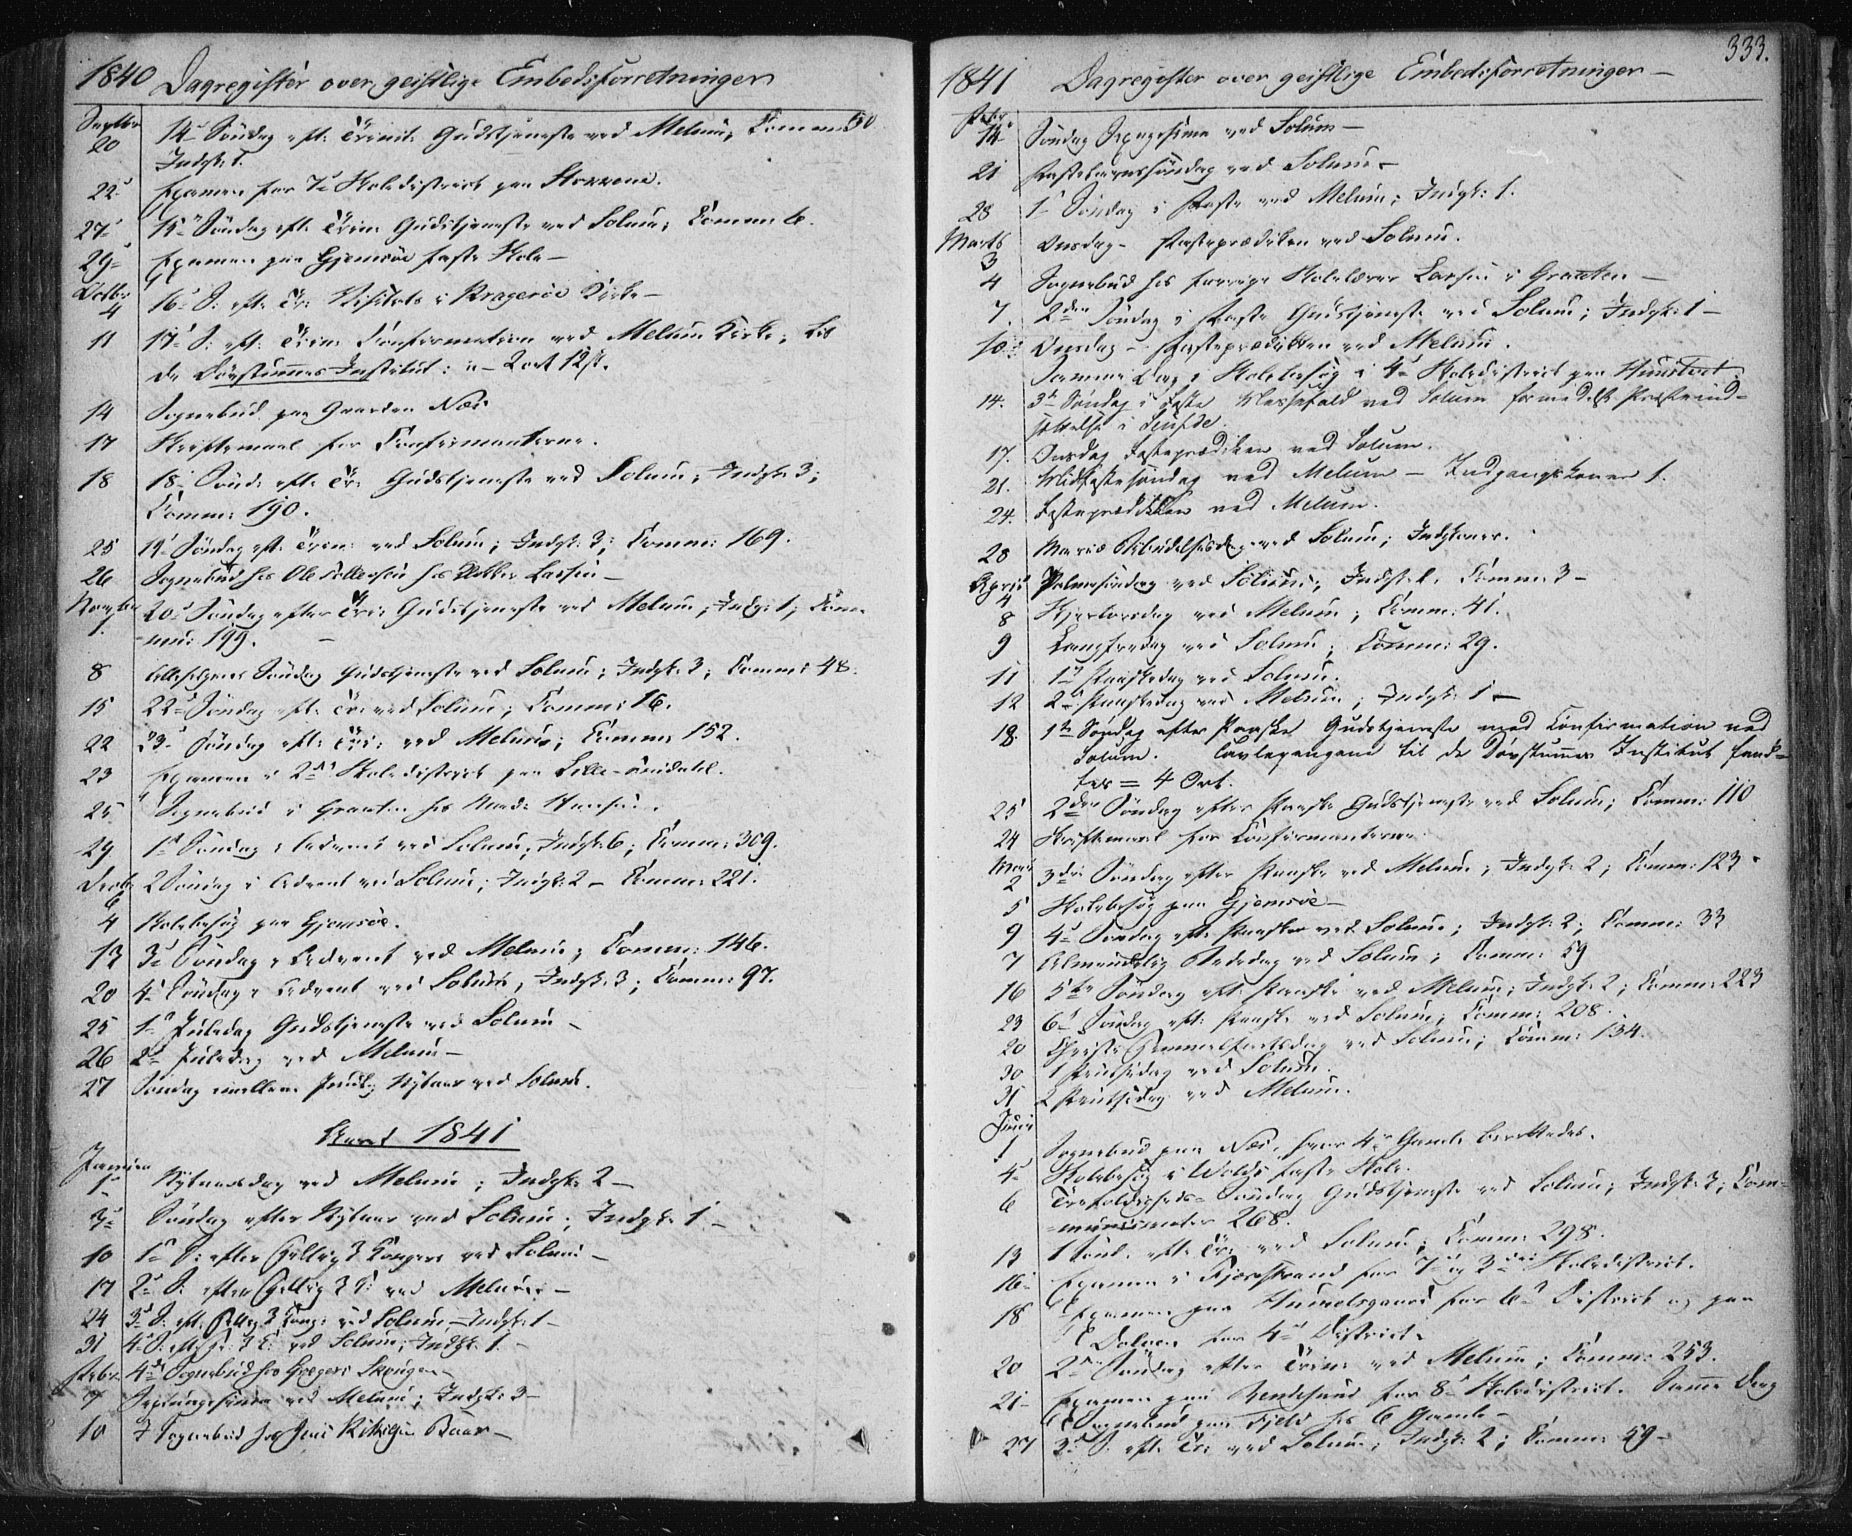 SAKO, Solum kirkebøker, F/Fa/L0005: Ministerialbok nr. I 5, 1833-1843, s. 333